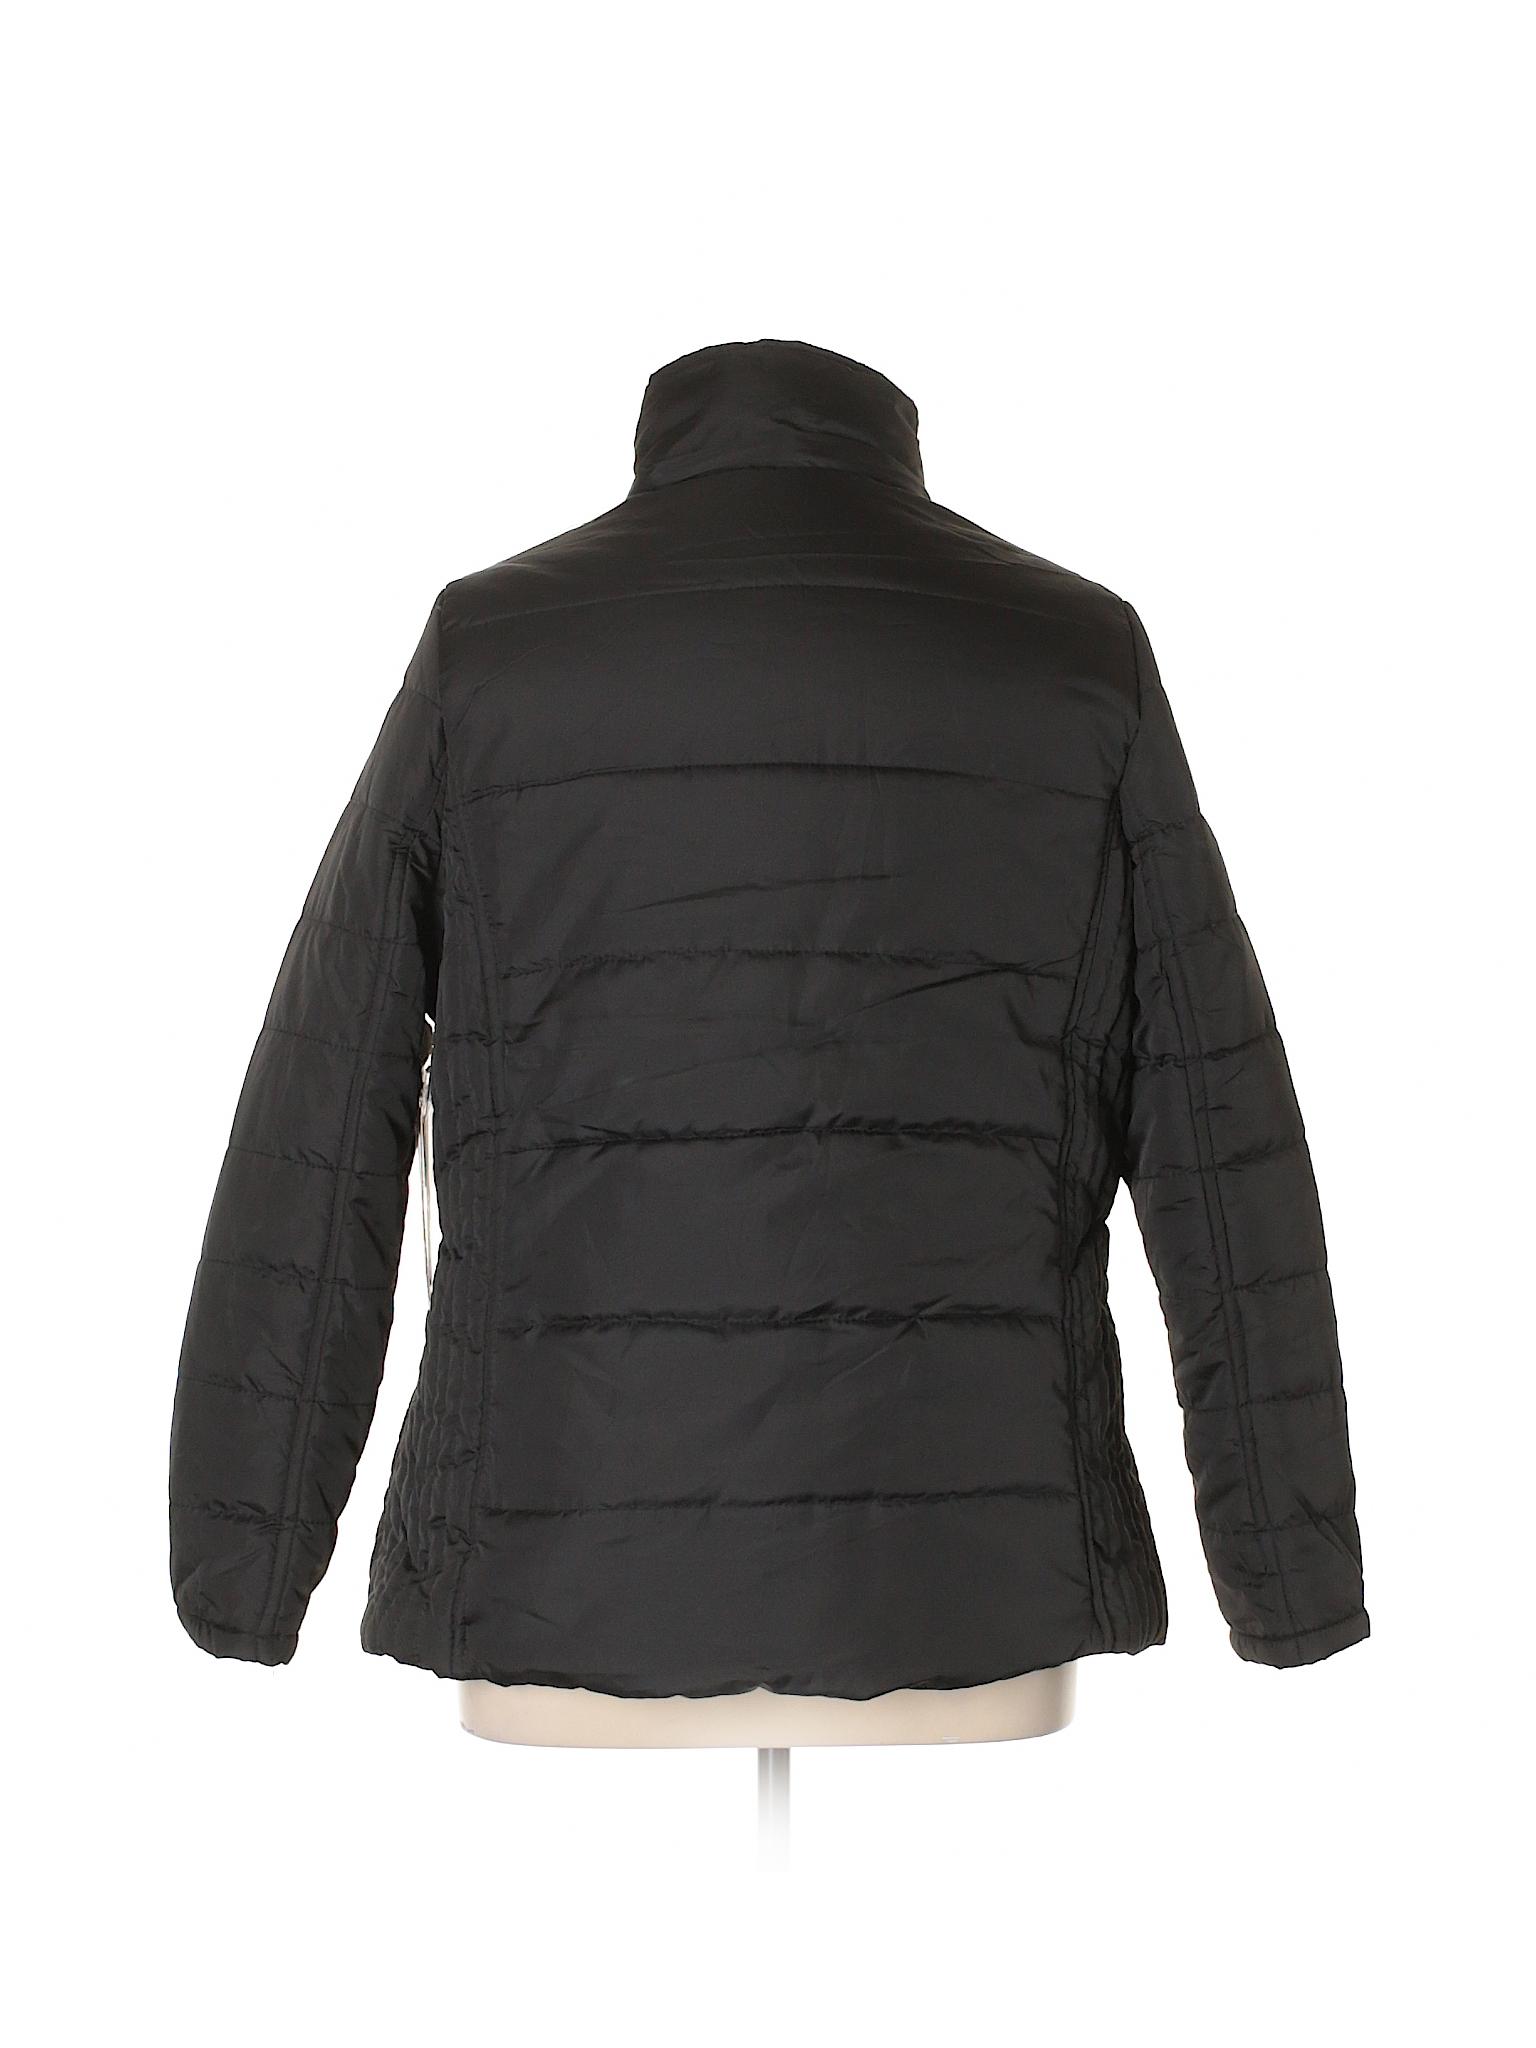 winter Boutique winter YMI Boutique Coat Coat YMI 0qHn8waxB